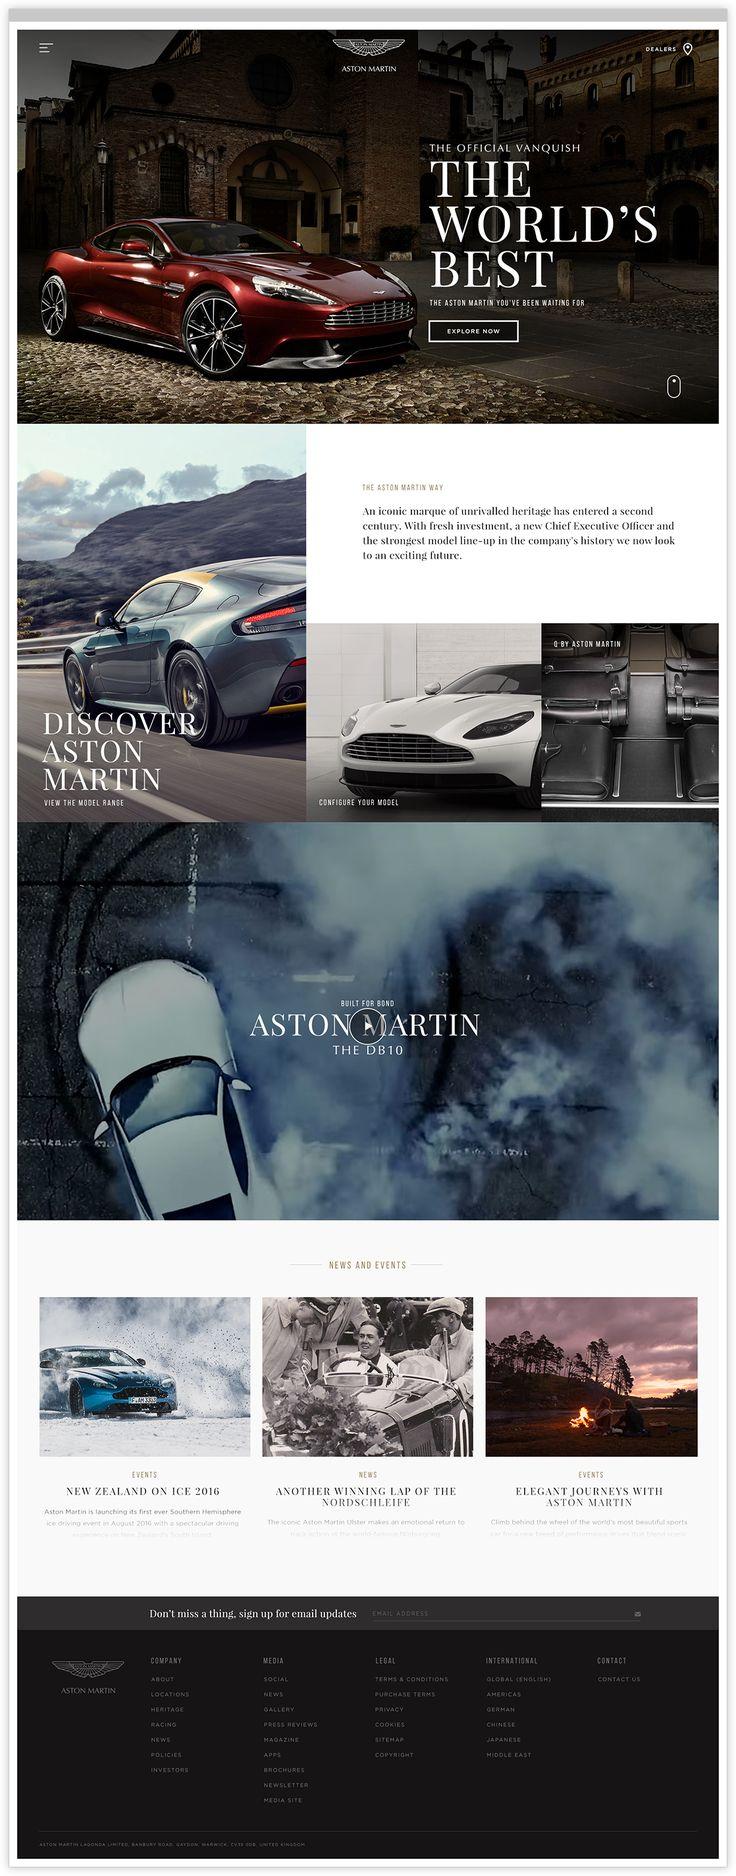 Aston Martin Homepage Web Design